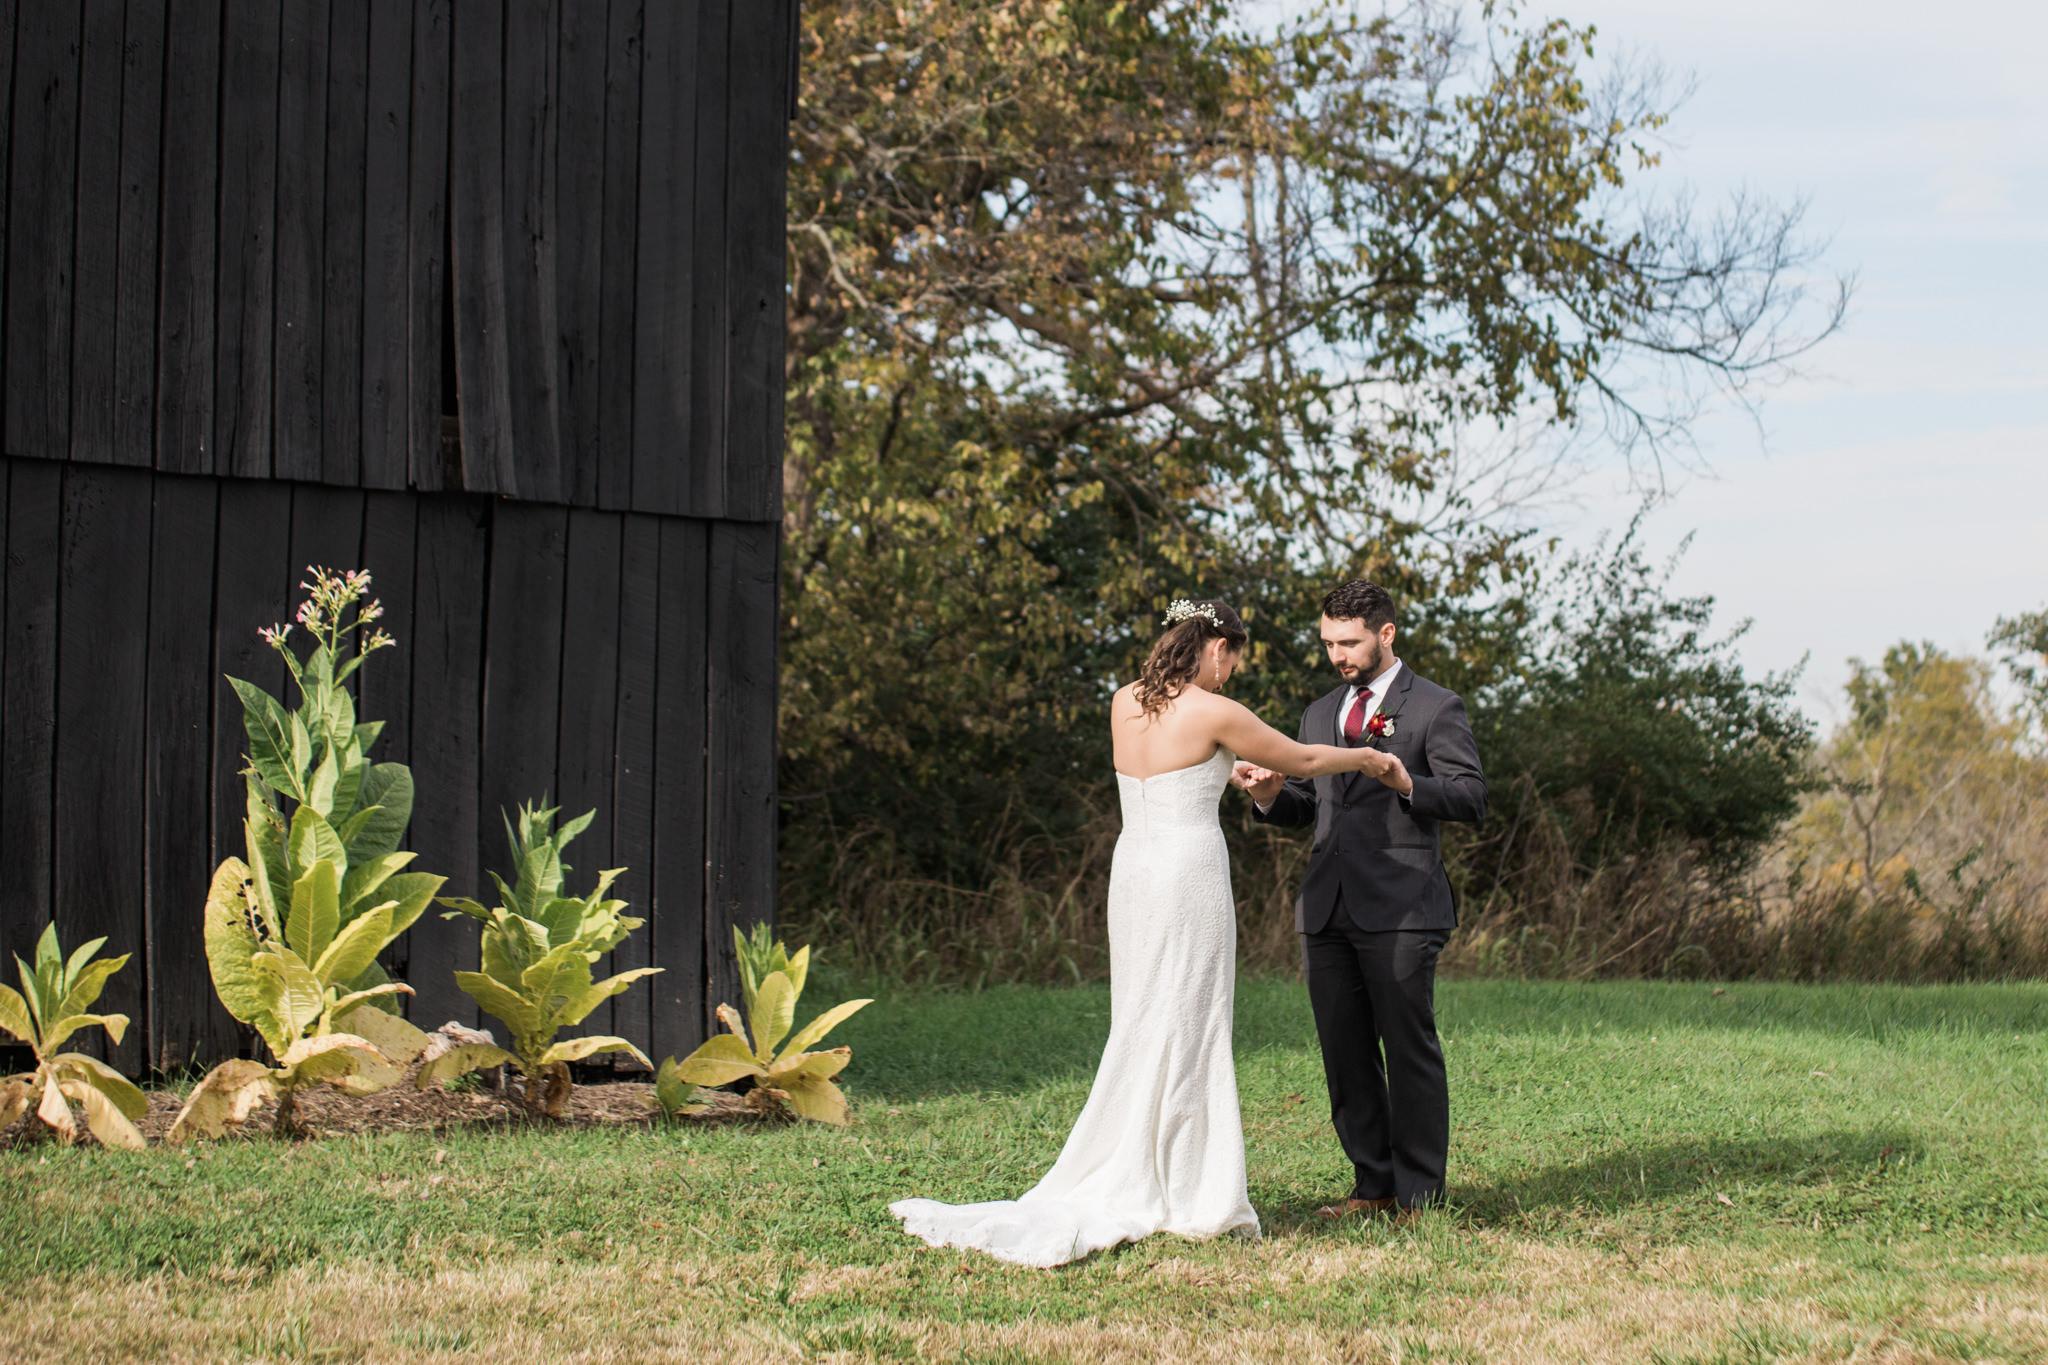 Jordan&Zack_Wedding_Blog_0027.jpg